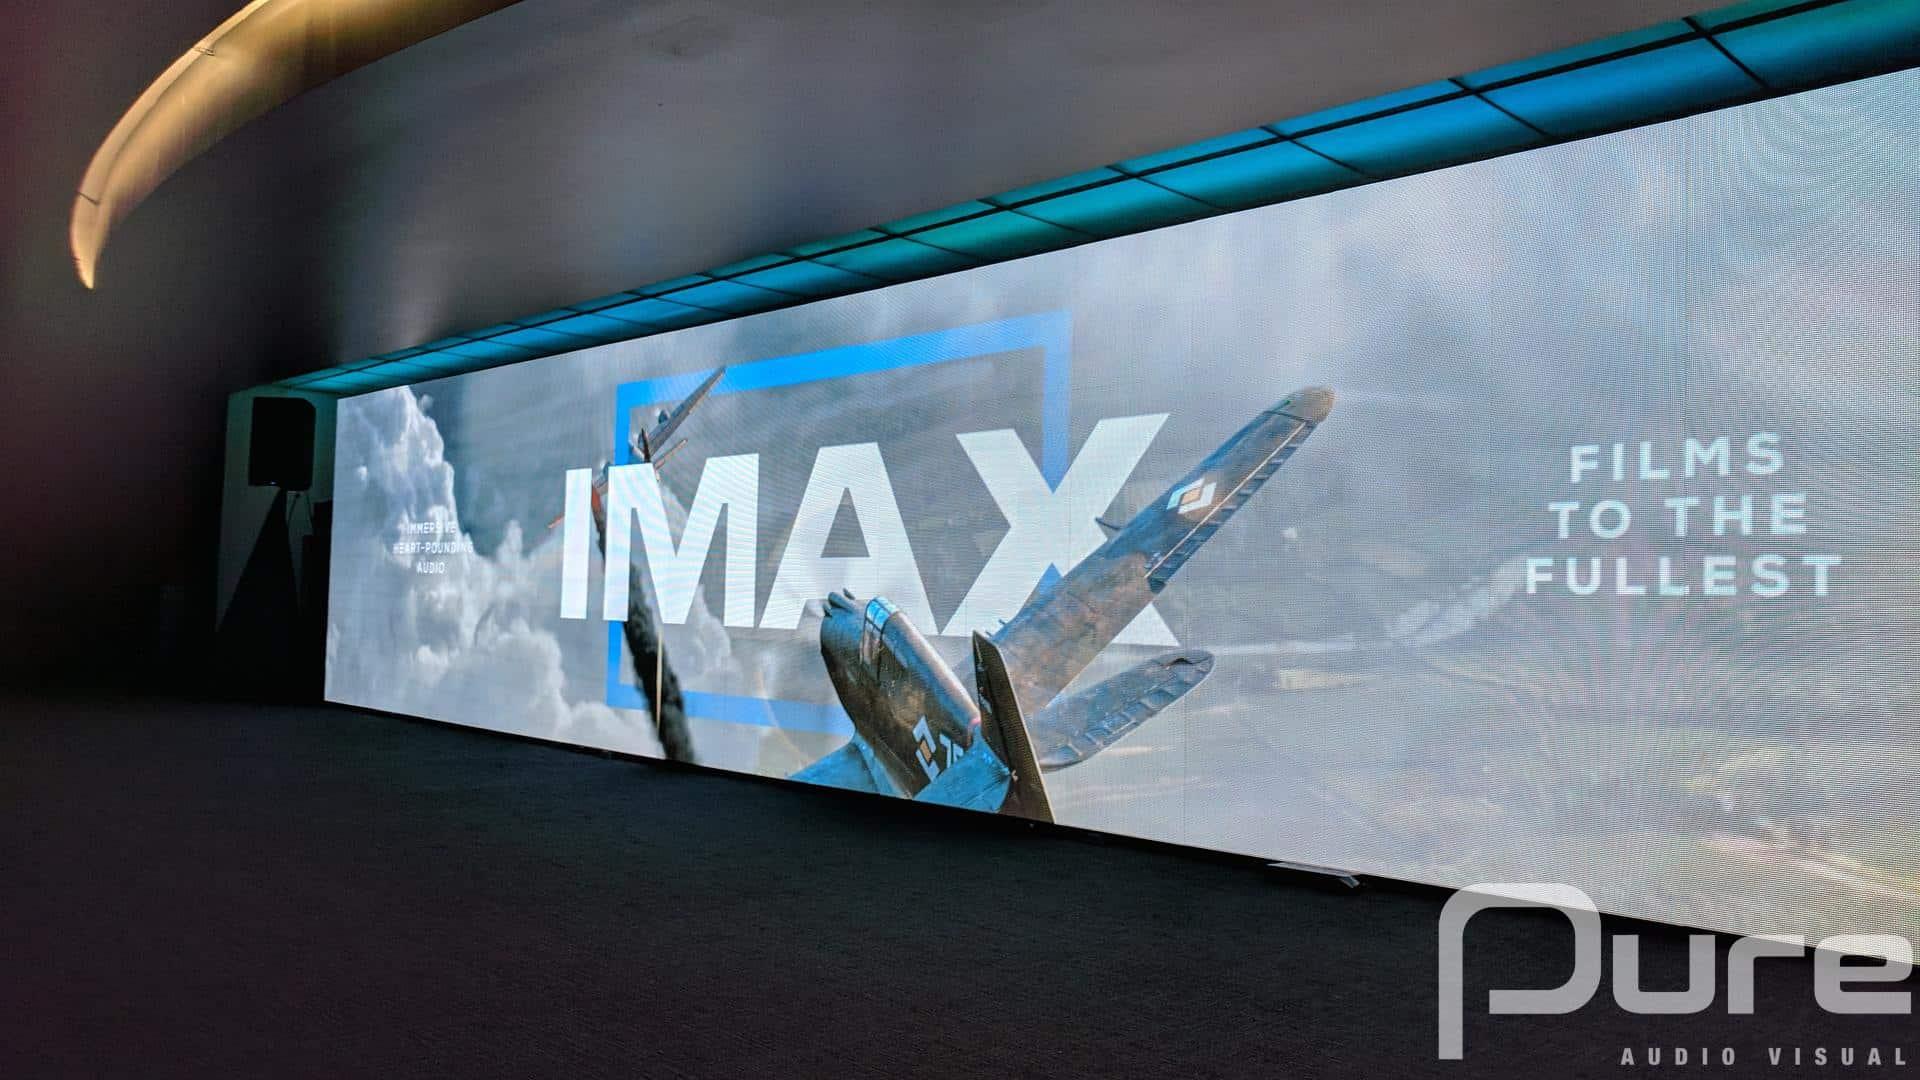 LED Video Wall, LED Panels, Audio Visual, AV Production, AV Gear